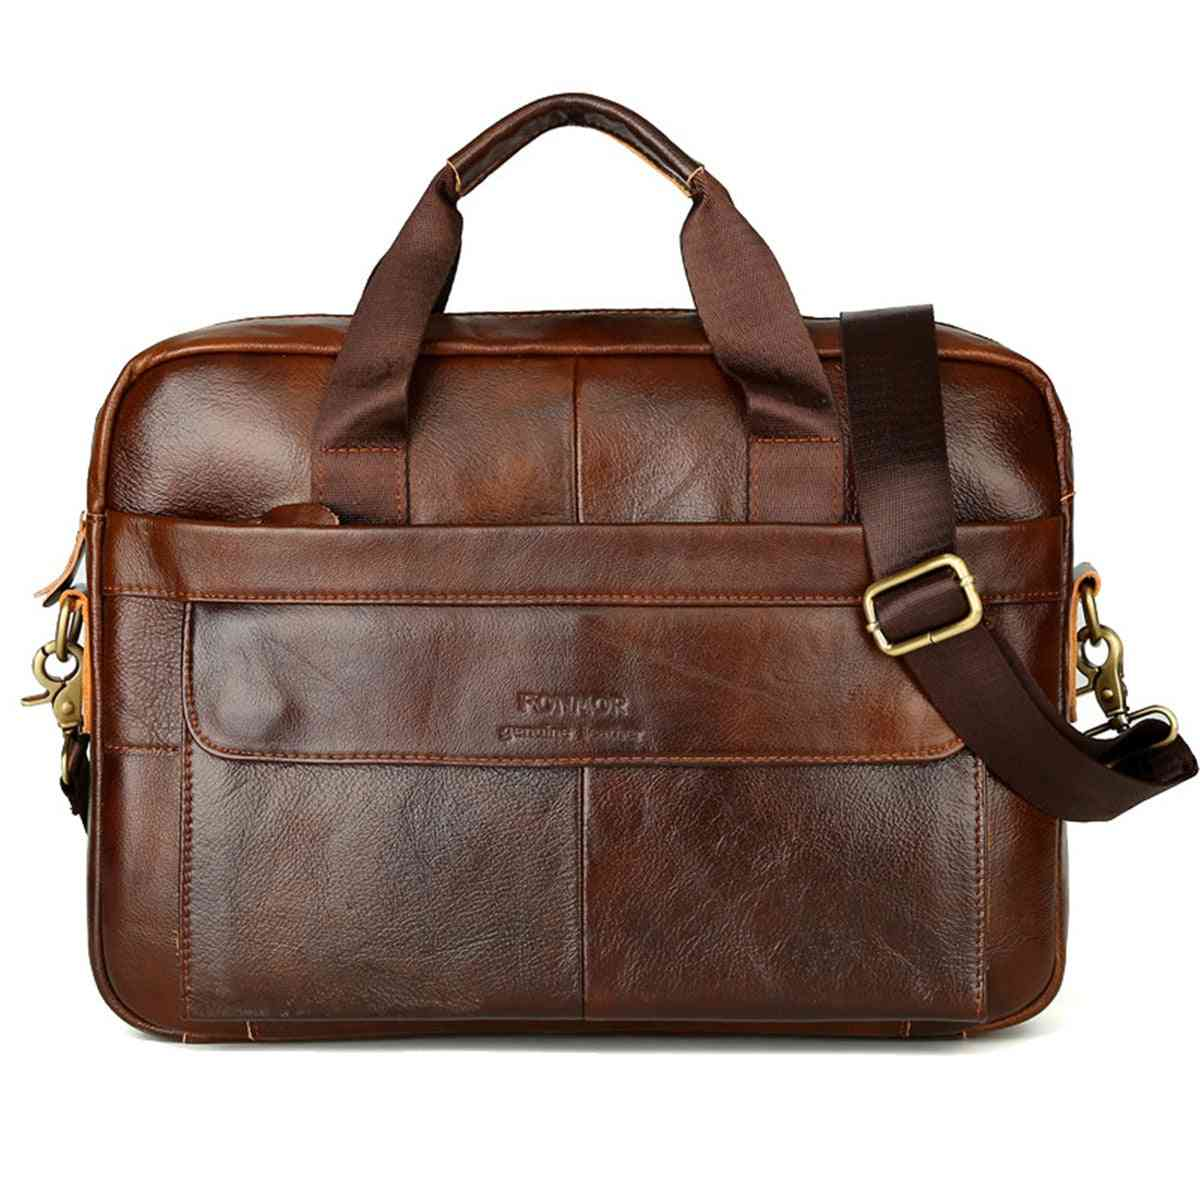 Briefcase Cowhide, Leather Handbags & Crossbody Messenger Bags's